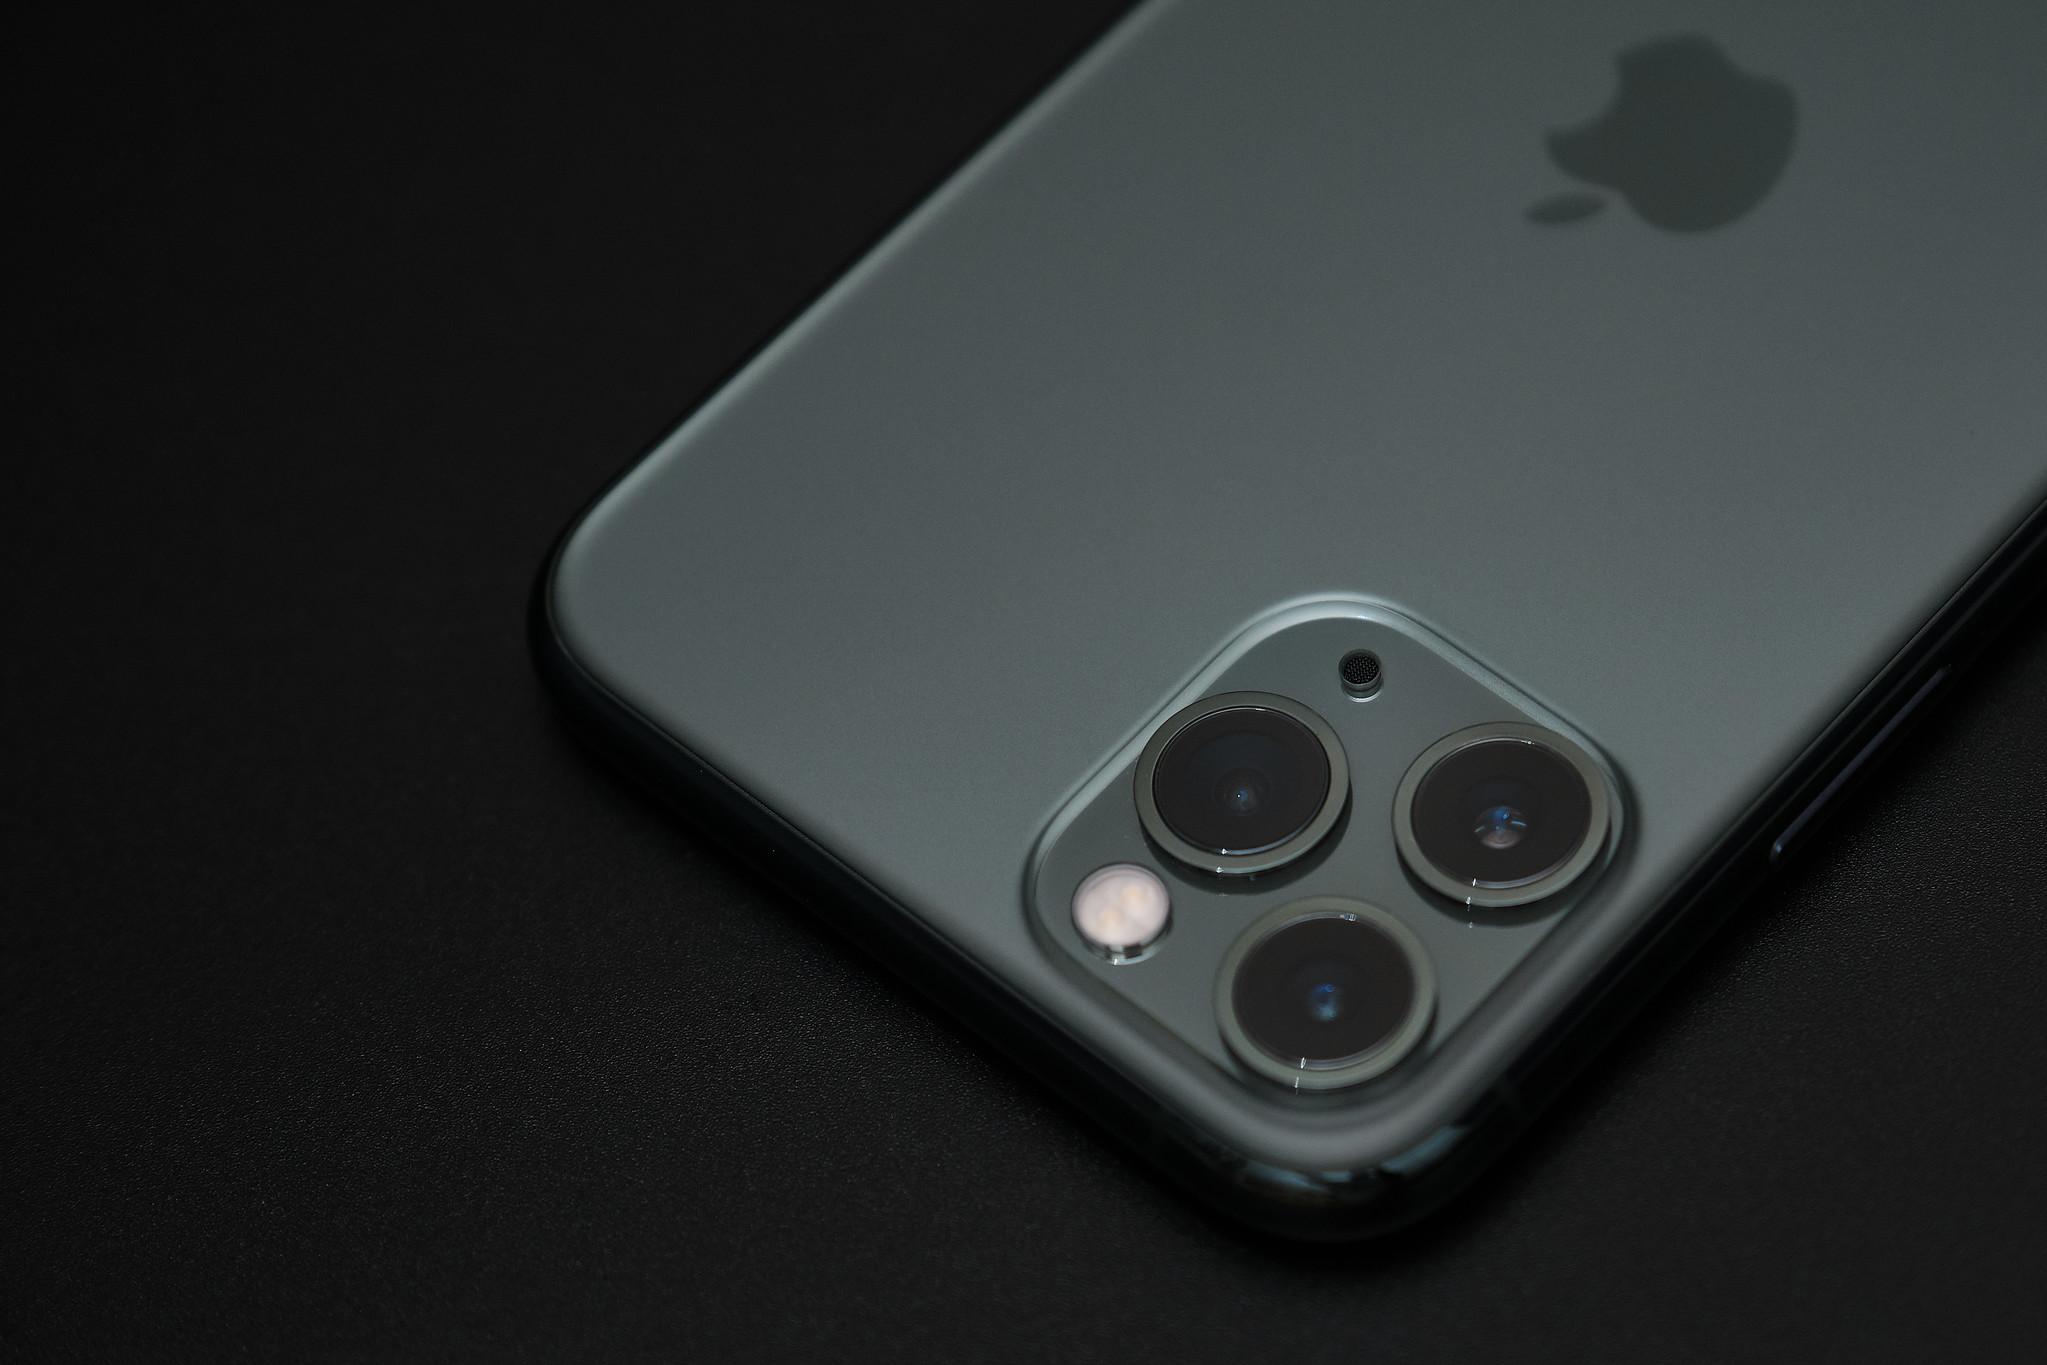 iPhone 11 Pro encryption